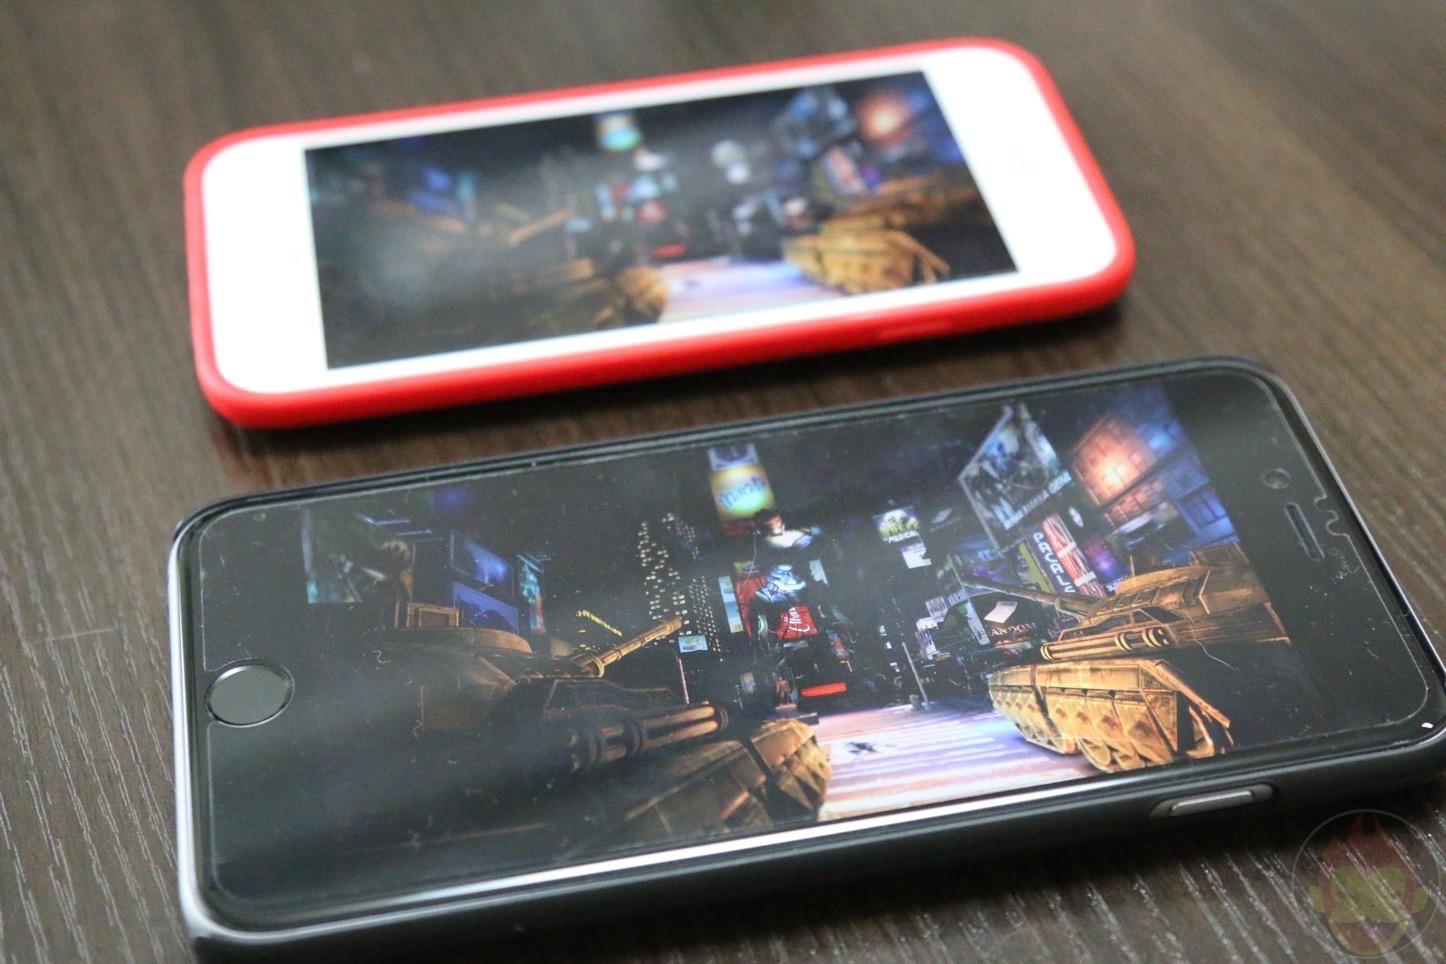 iPhone6s-6splus-comparison-benchmark-tests-07.JPG